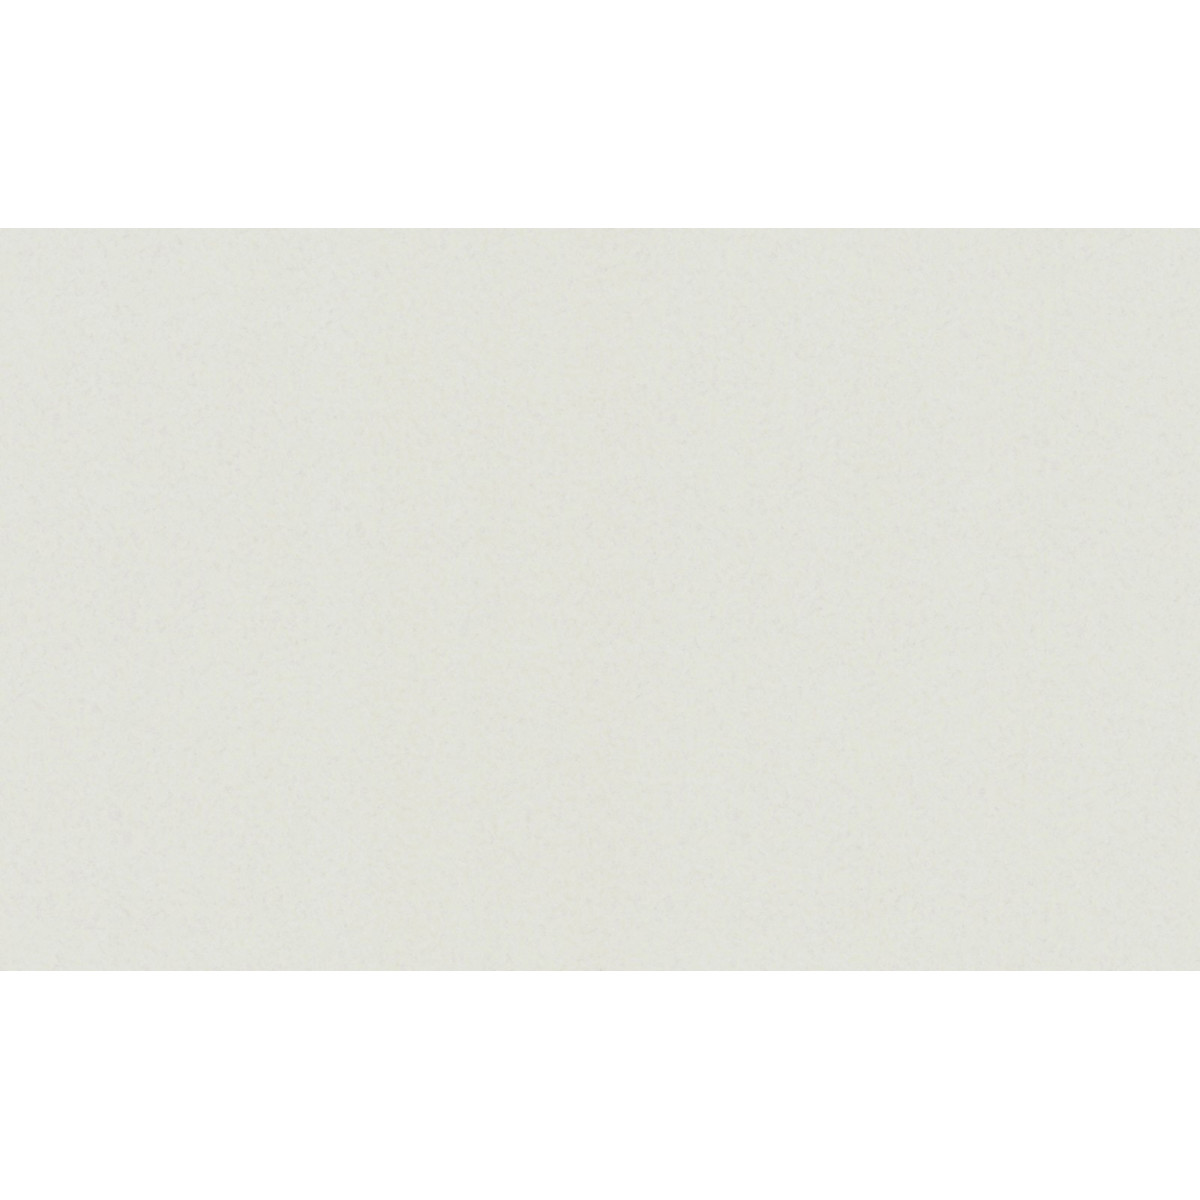 Обои флизелиновые Maxwall бежевые 1.06 м 159082-21